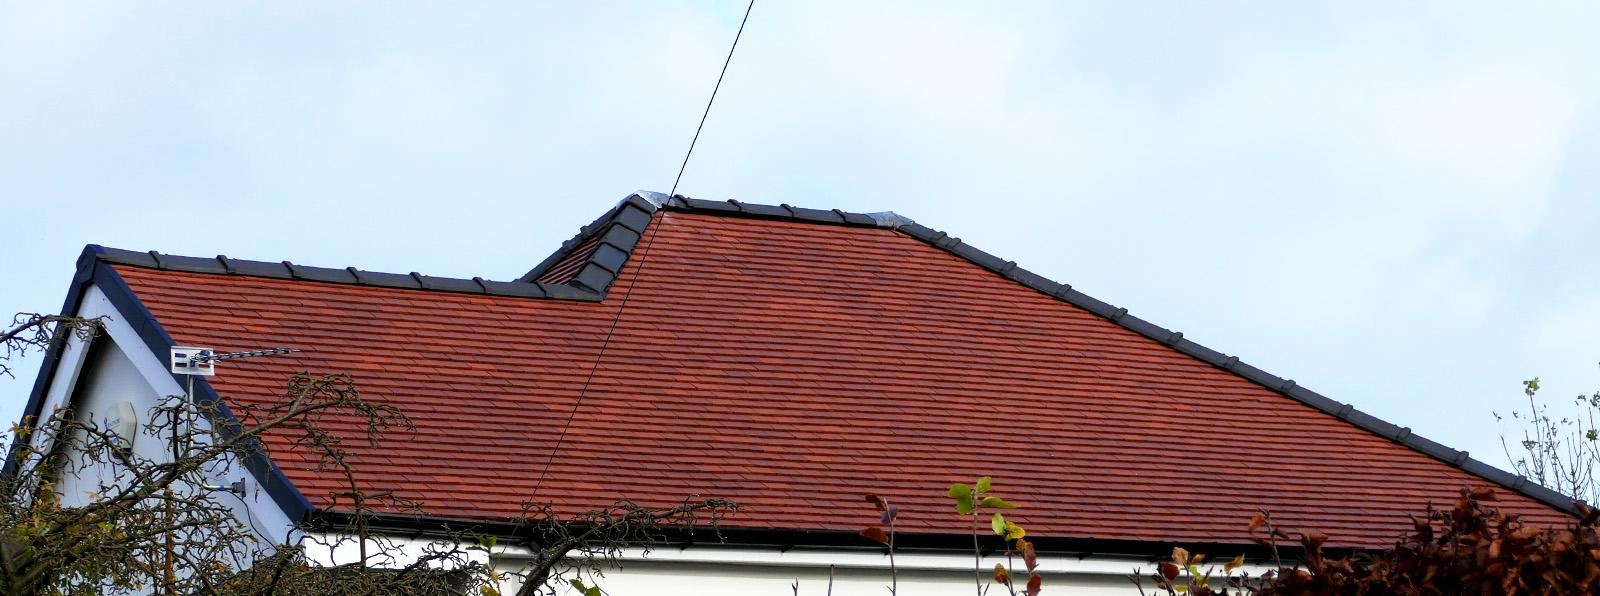 Marcher Roofing Leeds Roofing Specialist